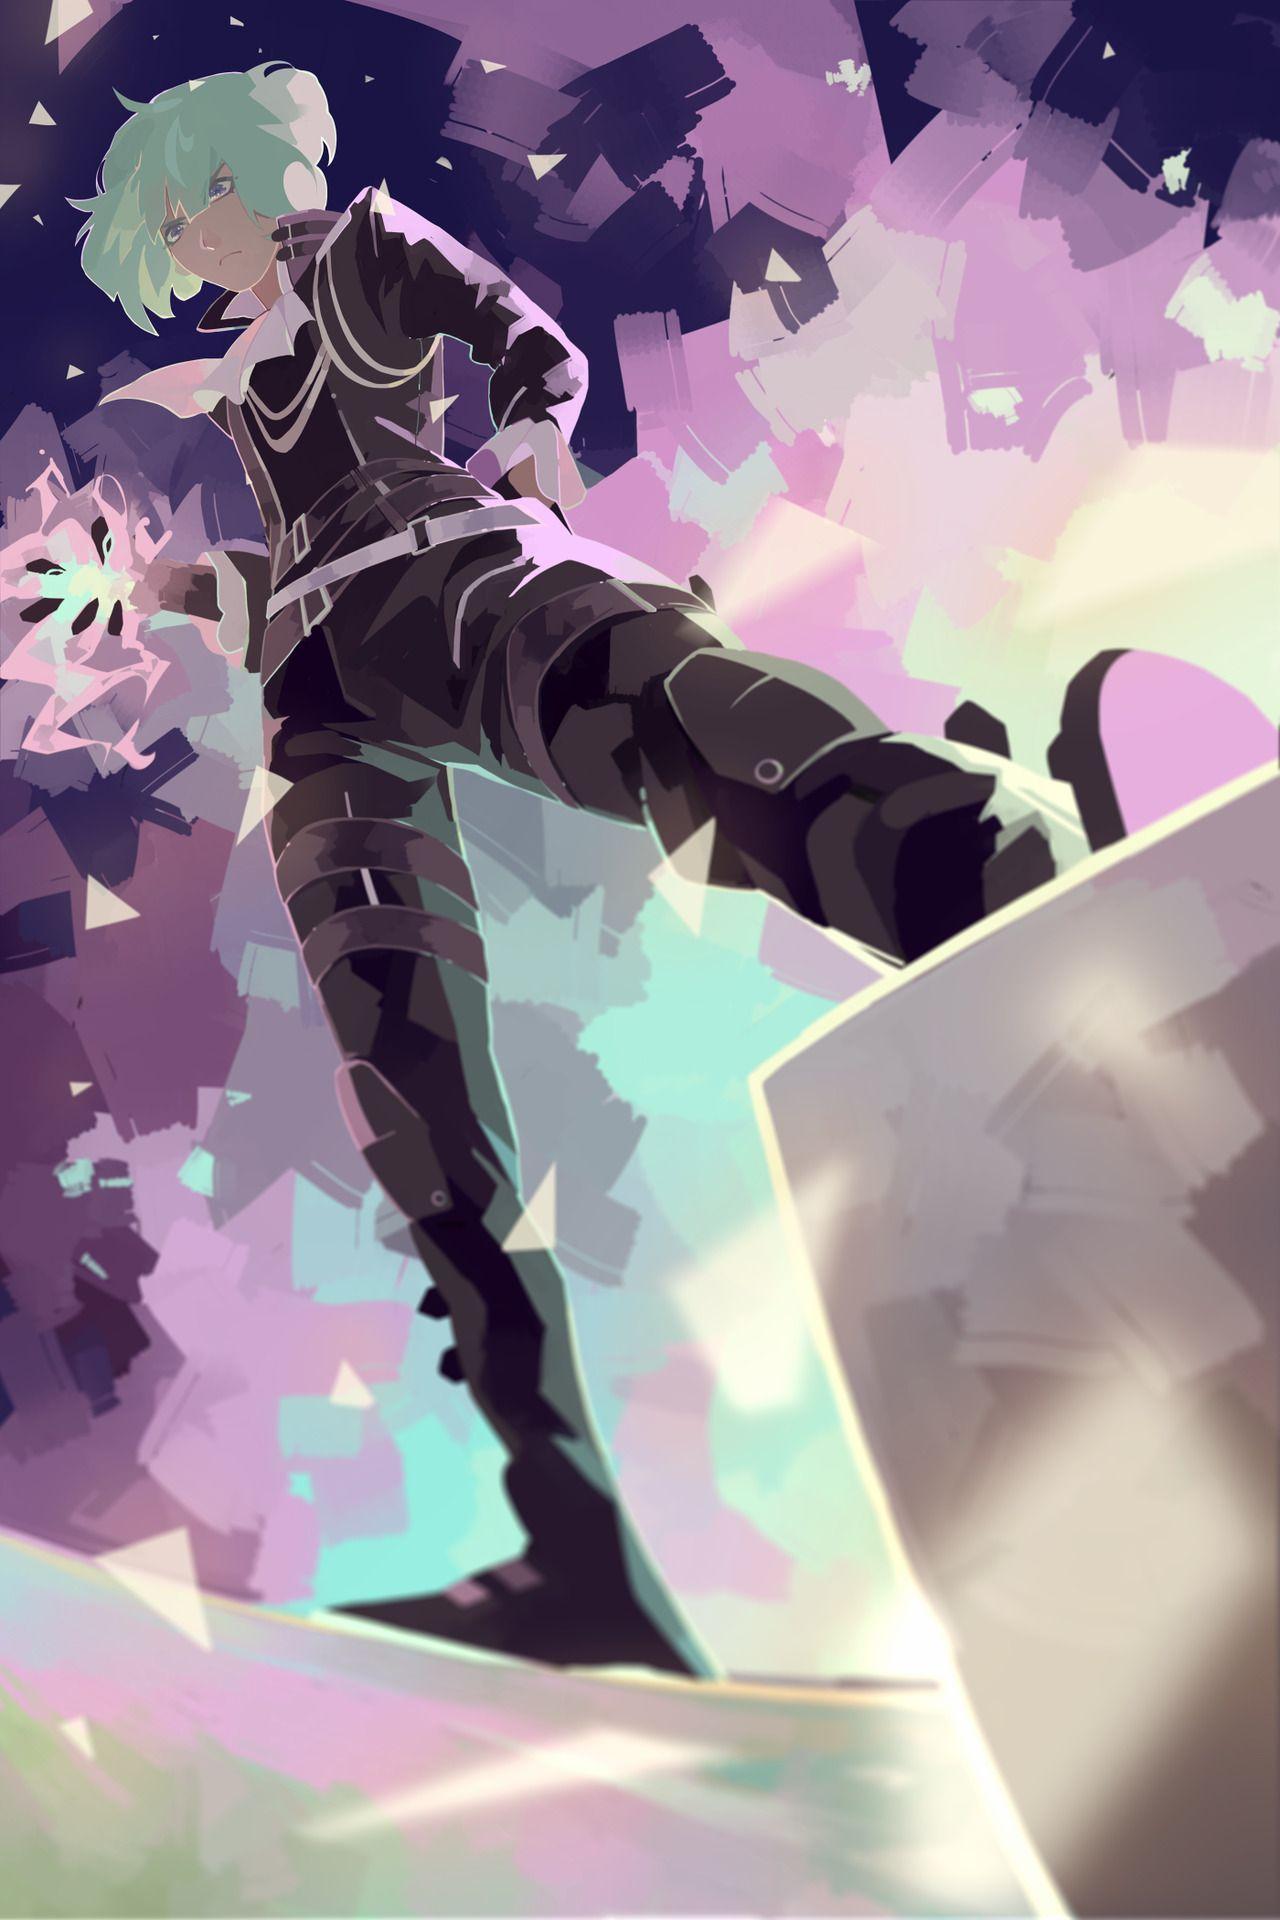 Log Horizon Ost in 2020 Art, Character art, Anime movies